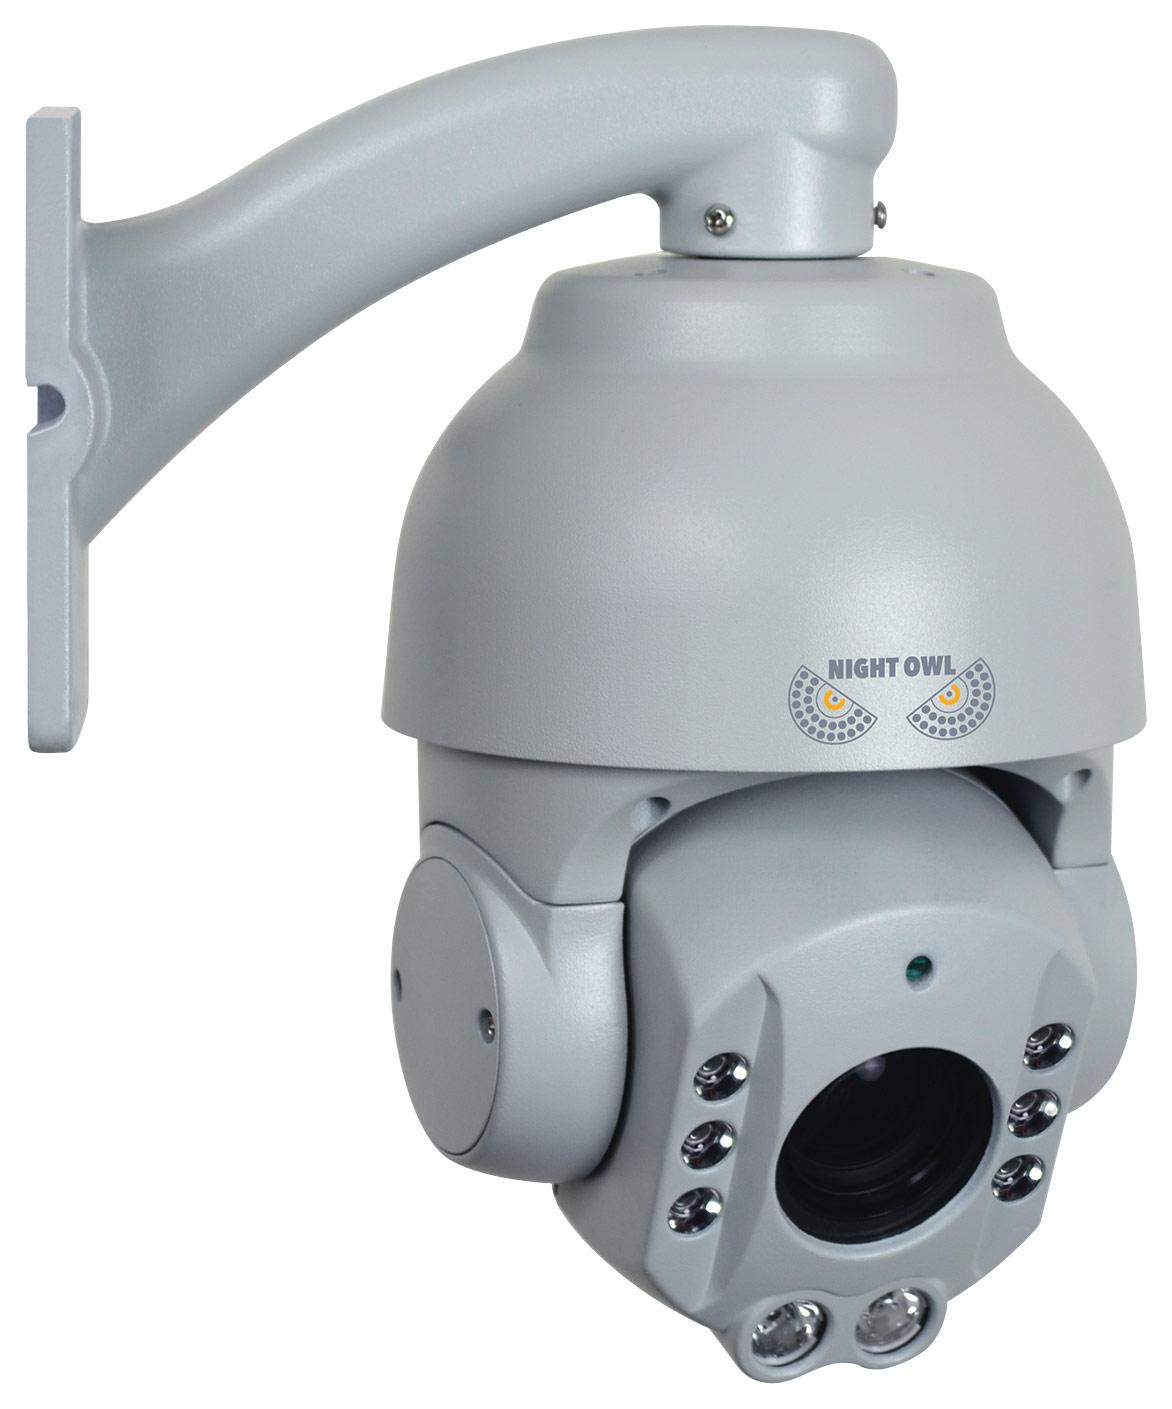 Night Owl AHD Series PTZ Surveillance Camera for Most Night Owl AHD Surveillance Systems Gray CAM-PTZ18X-AHD7